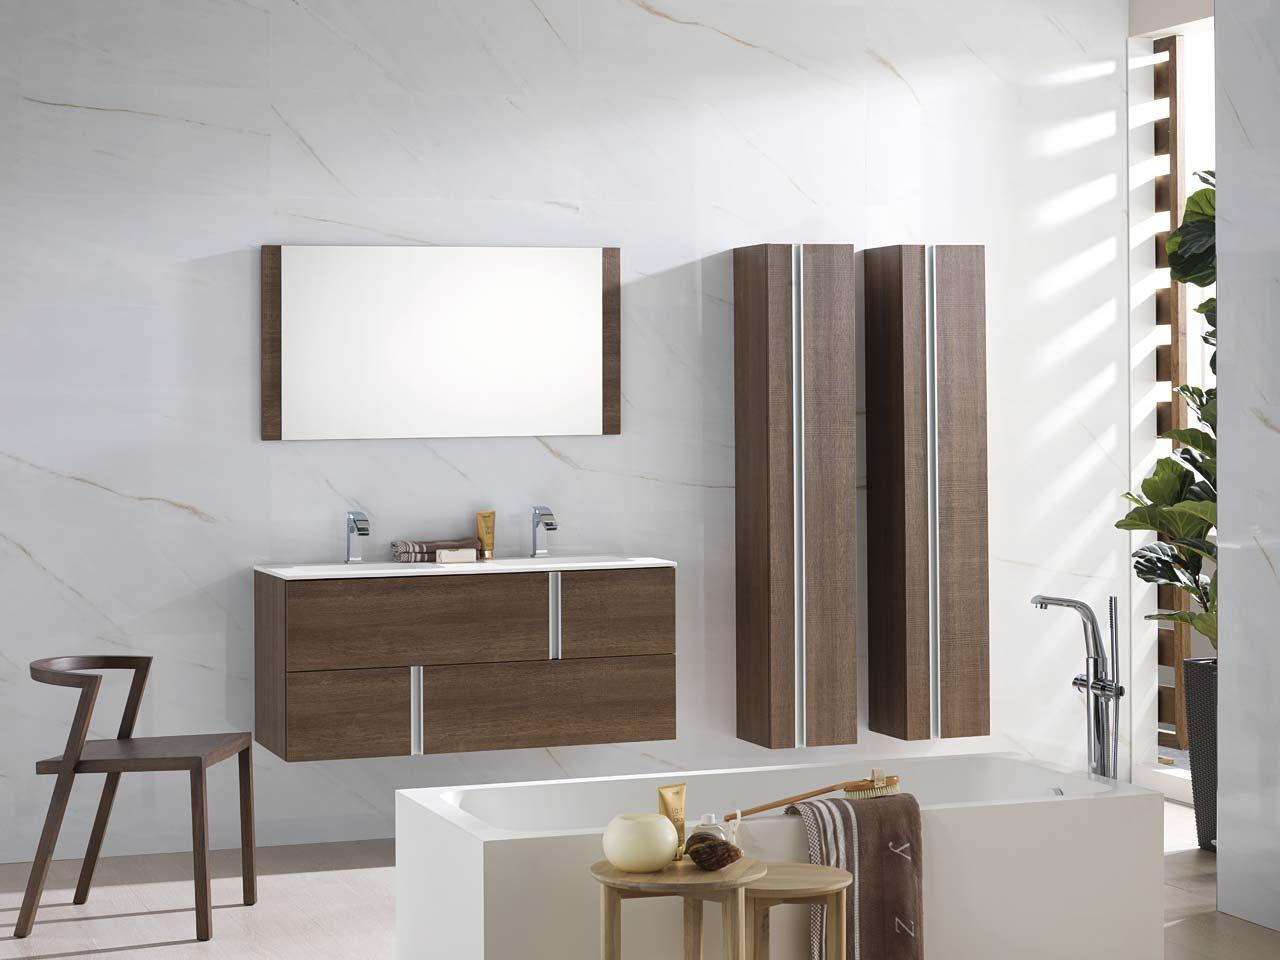 Porcelanosa vanity with bathroom vanities on furniture 5 for Porcelanosa bathroom vanities